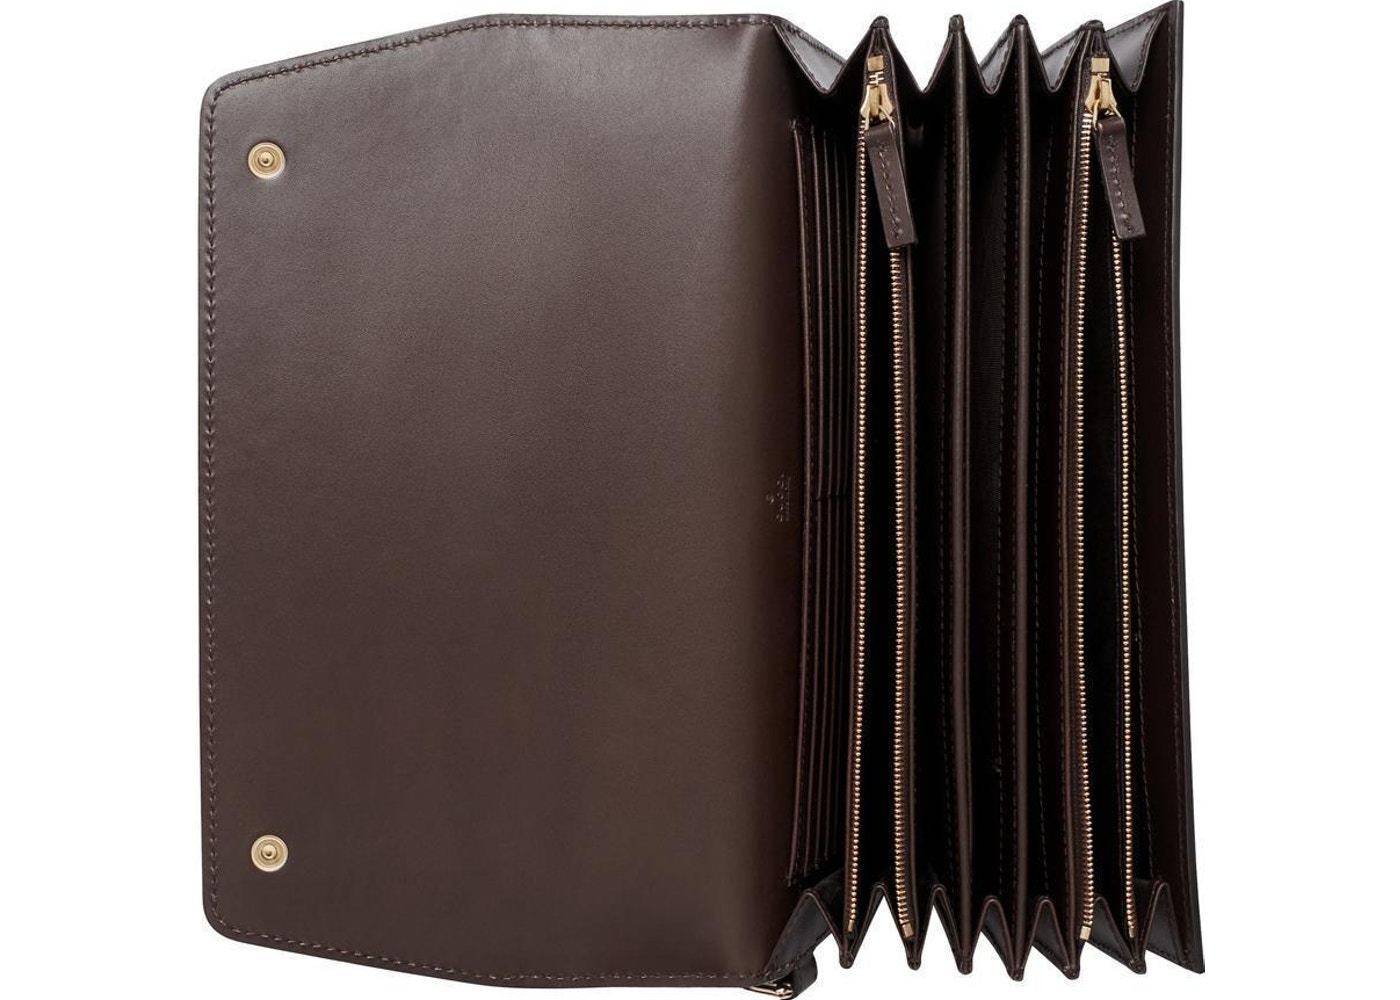 cbdb1e3b2491 Gucci Travel Document Case Wallet Supreme Monogram GG Beige/Ebony